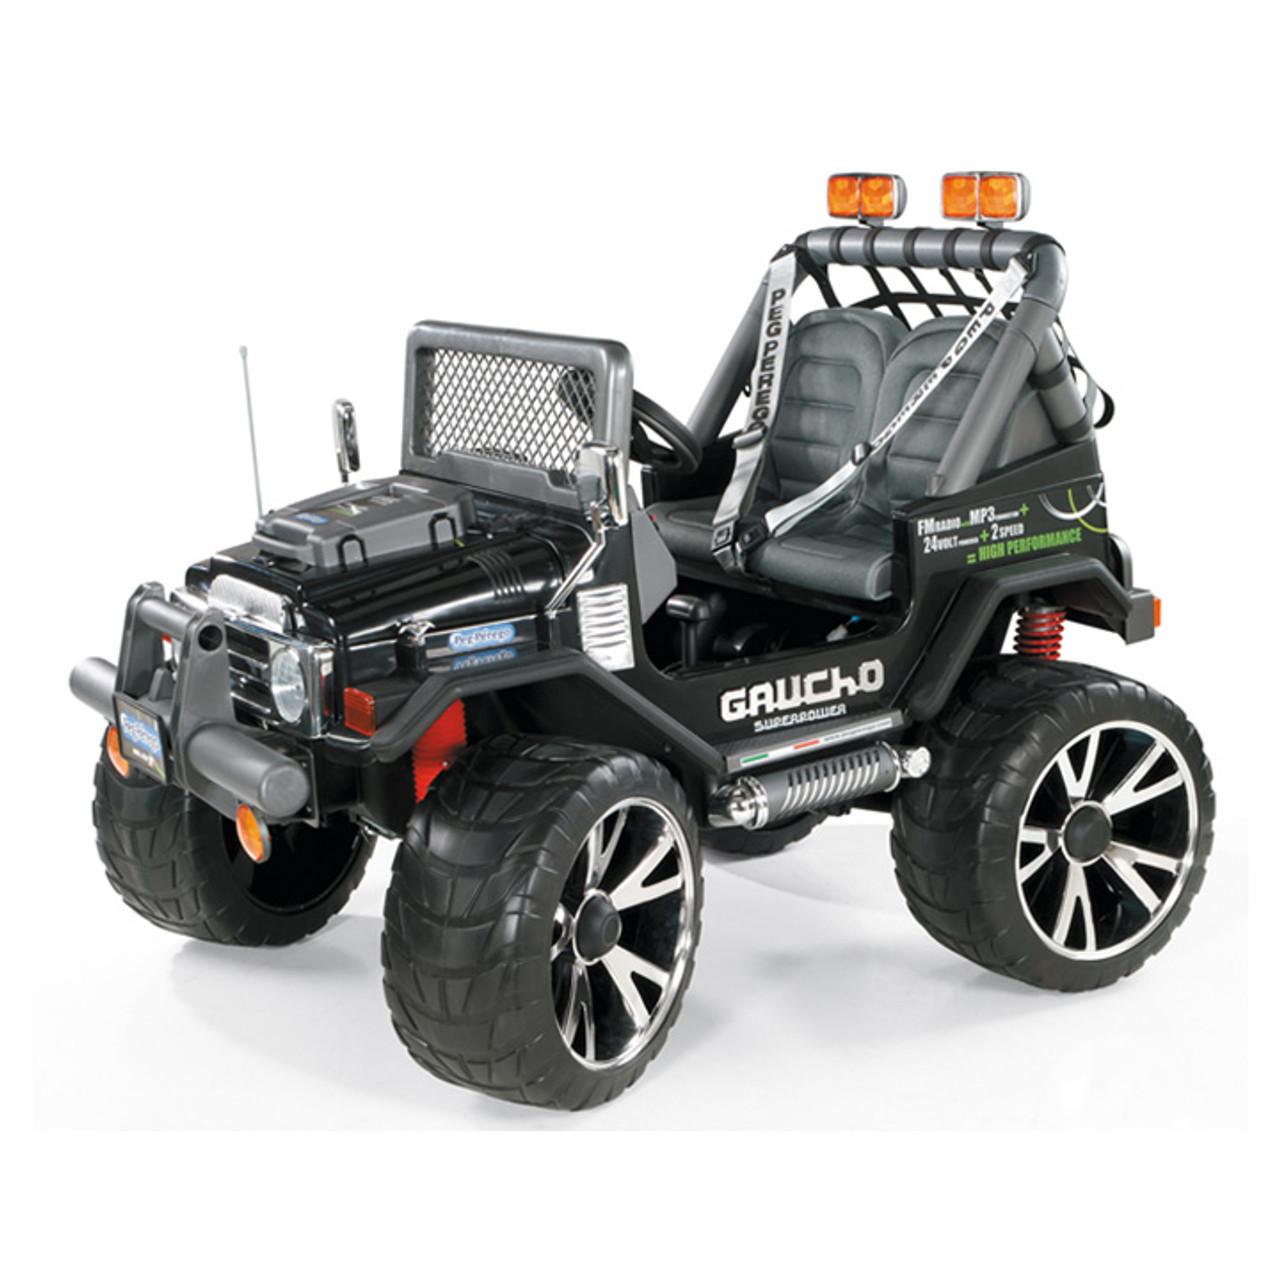 2 Seat Superpower Gaucho Peg Perego 24v 4X4 With EVA Tyres Toolkit